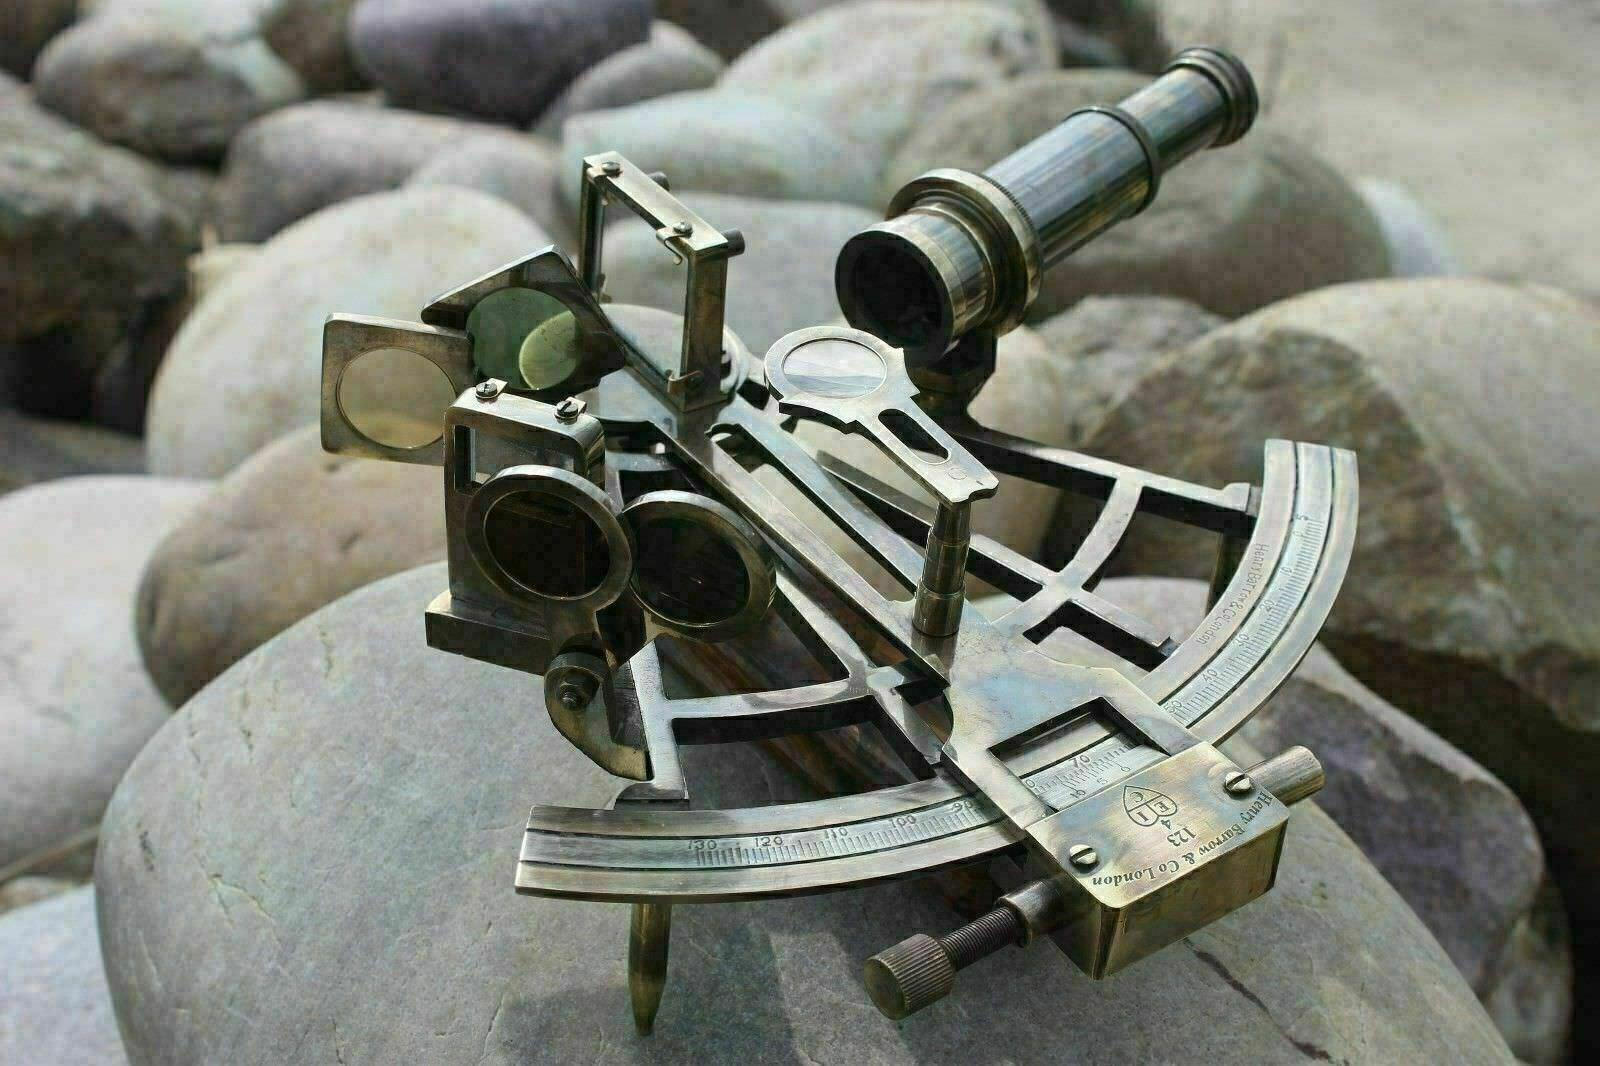 Brass 8 Sextant Antique Nautical Marine Navigational Astrolabe Instrument Gift - $69.00